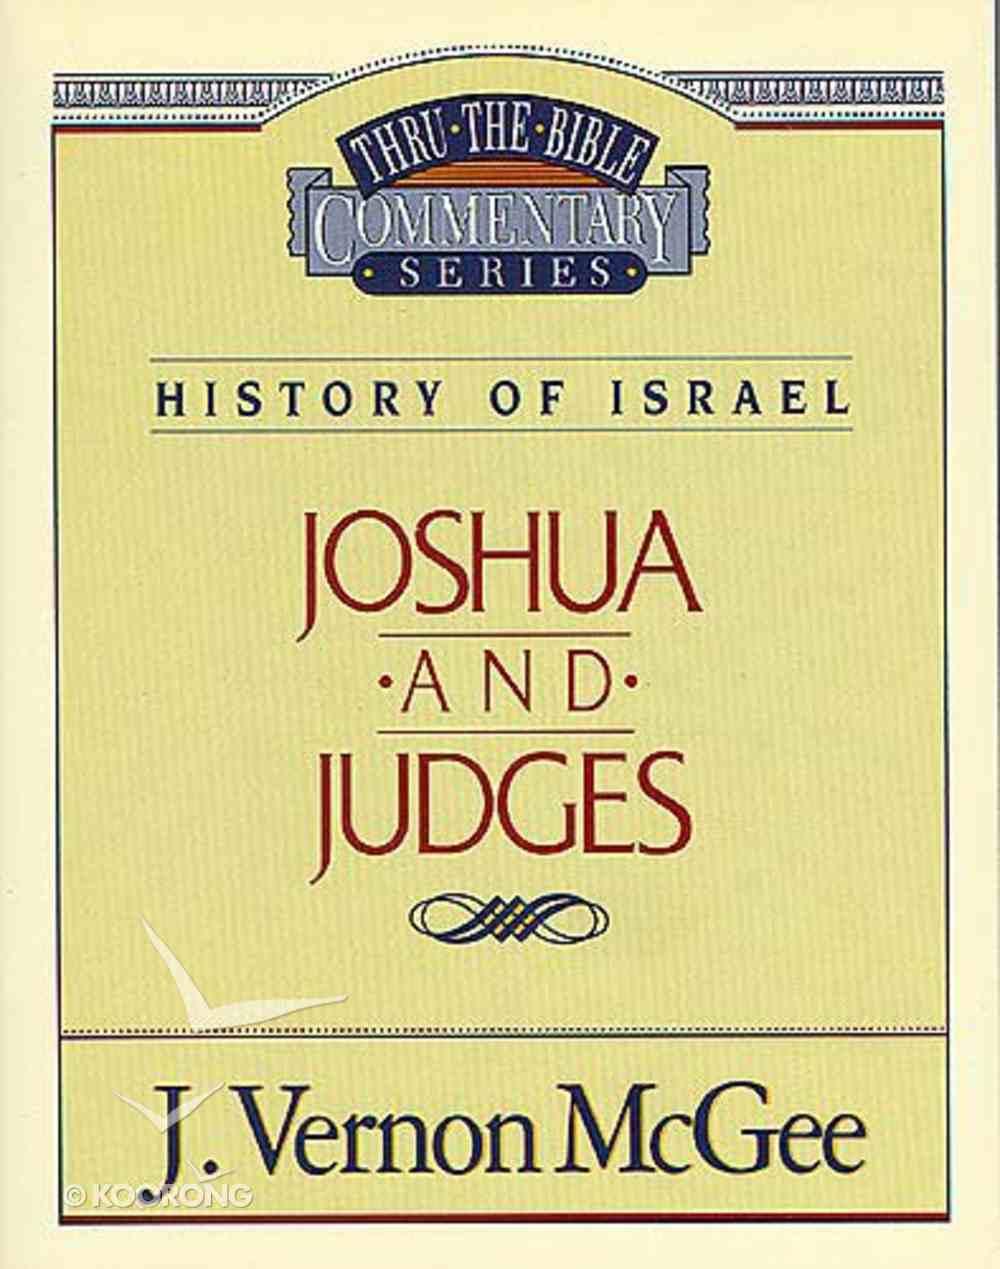 Thru the Bible OT #10: Joshua/Judges (#10 in Thru The Bible Old Testament Series) Paperback